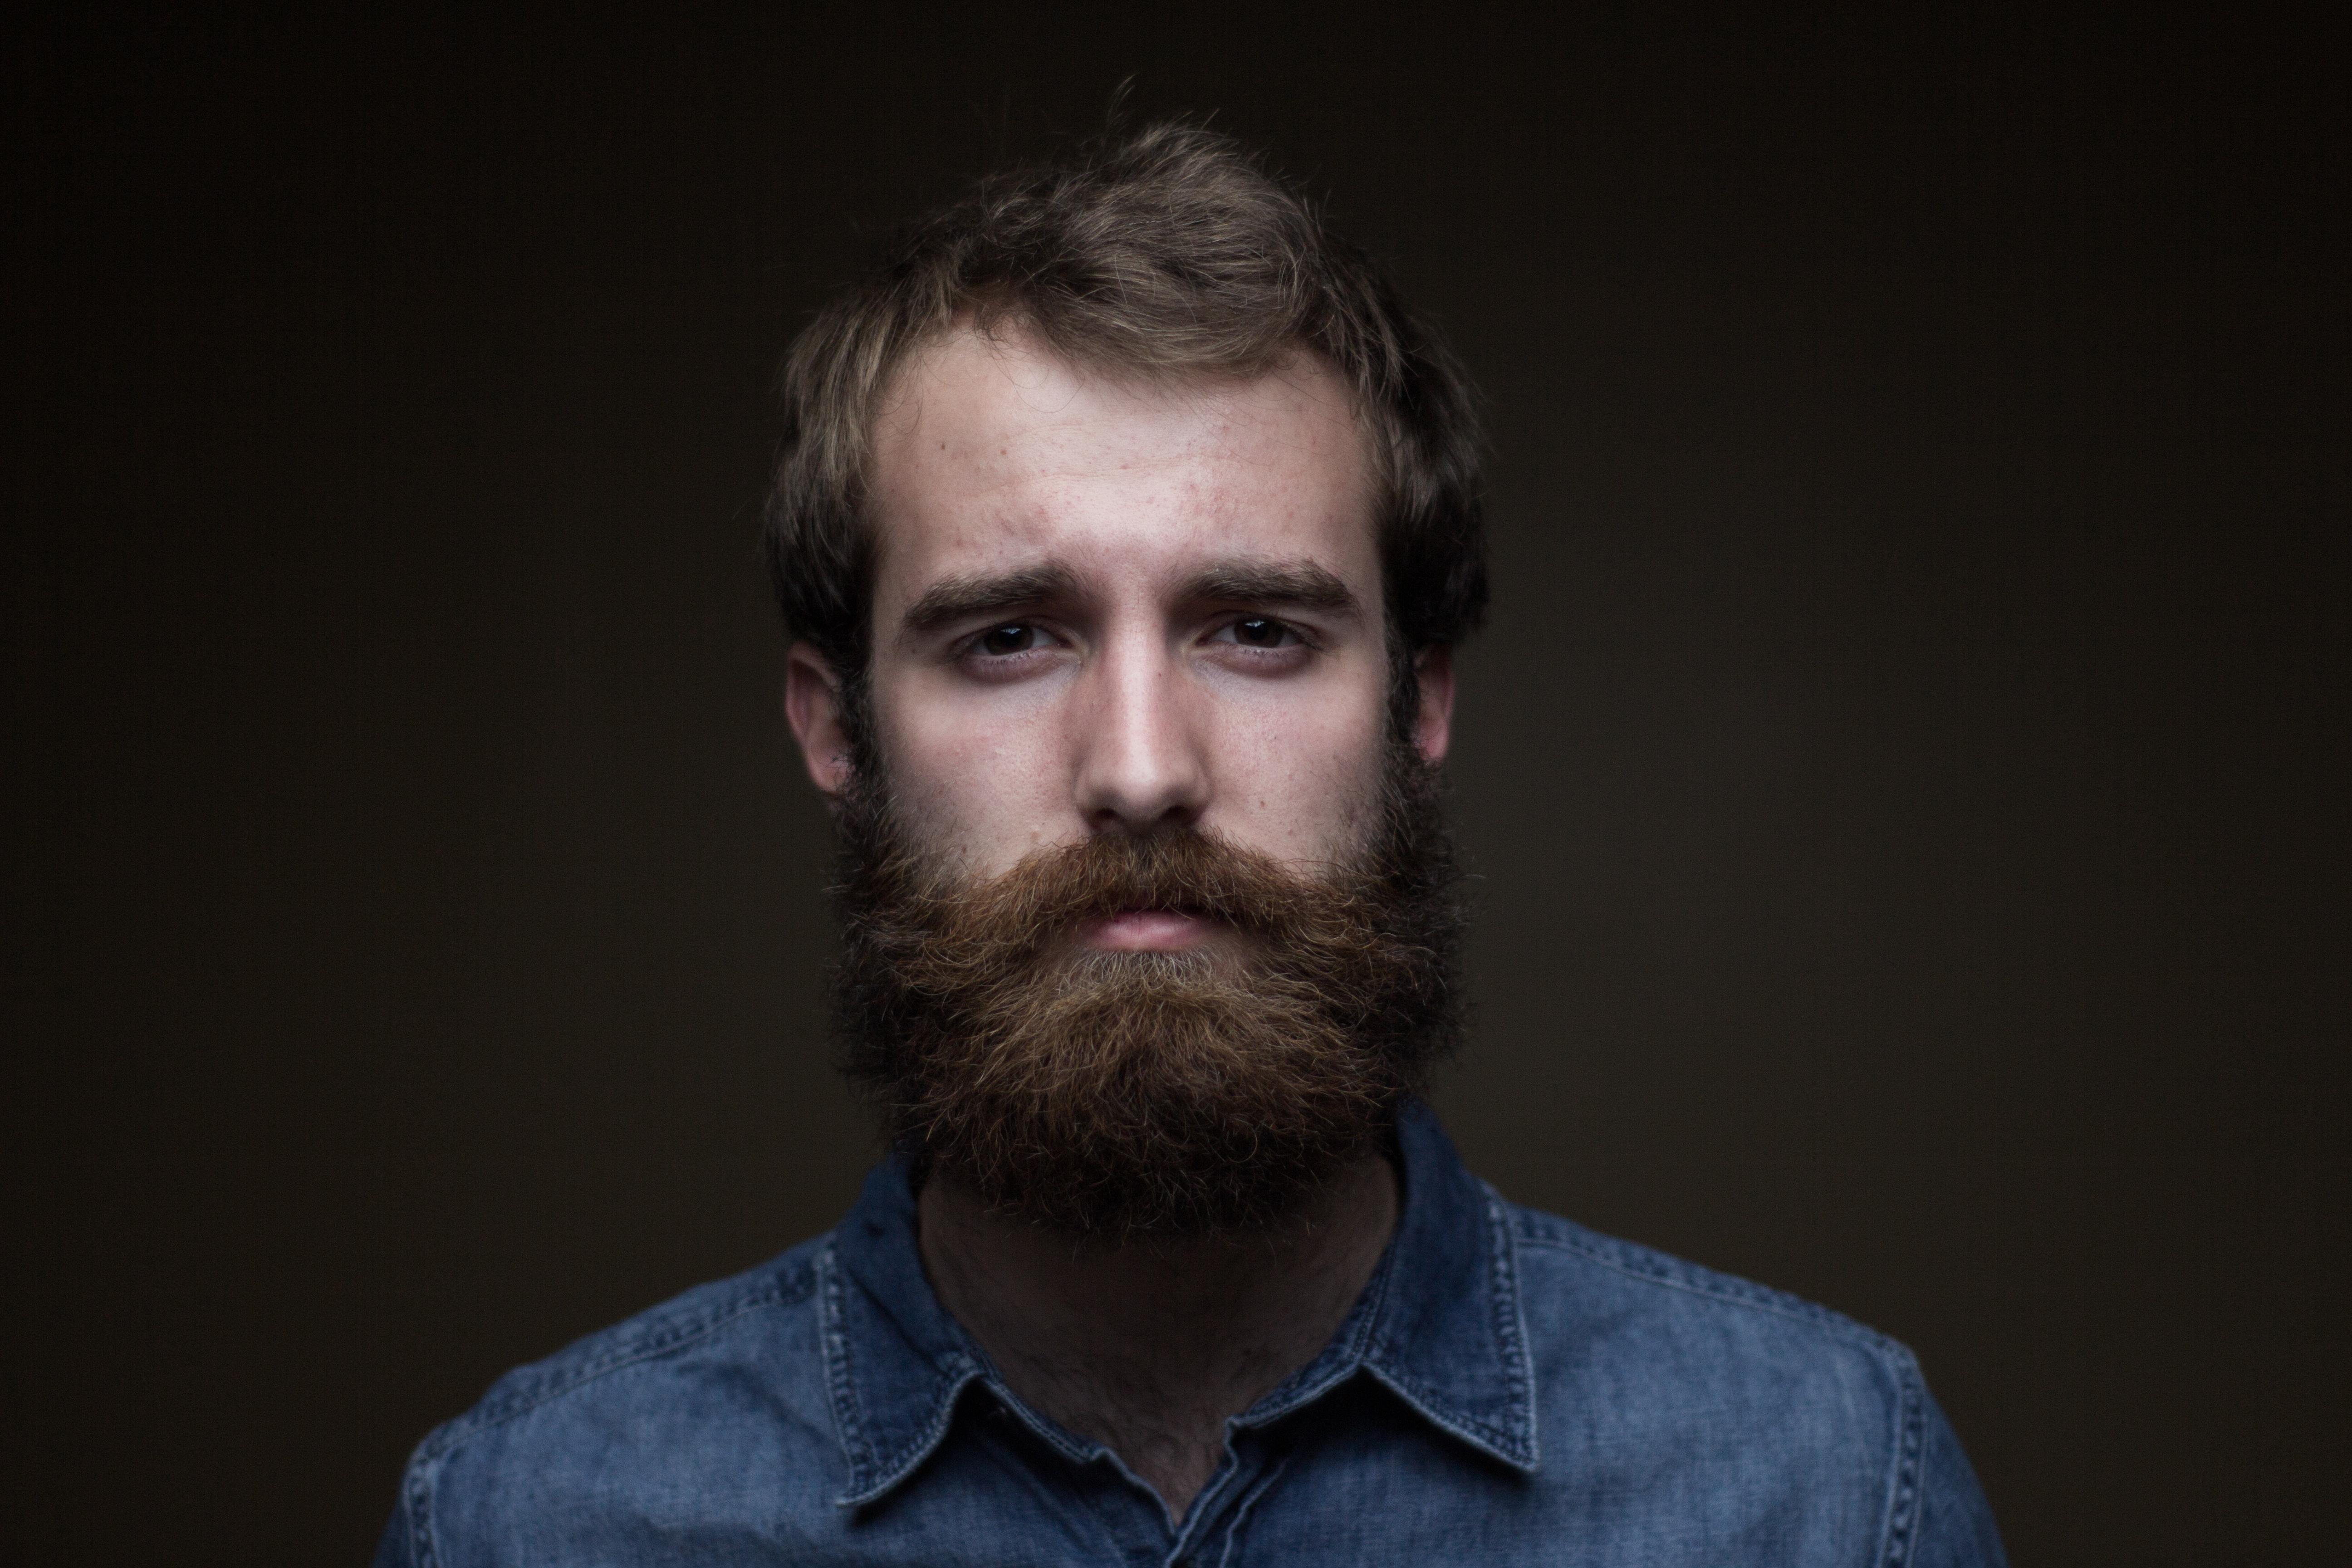 The Regal Beard of Jeremiah James